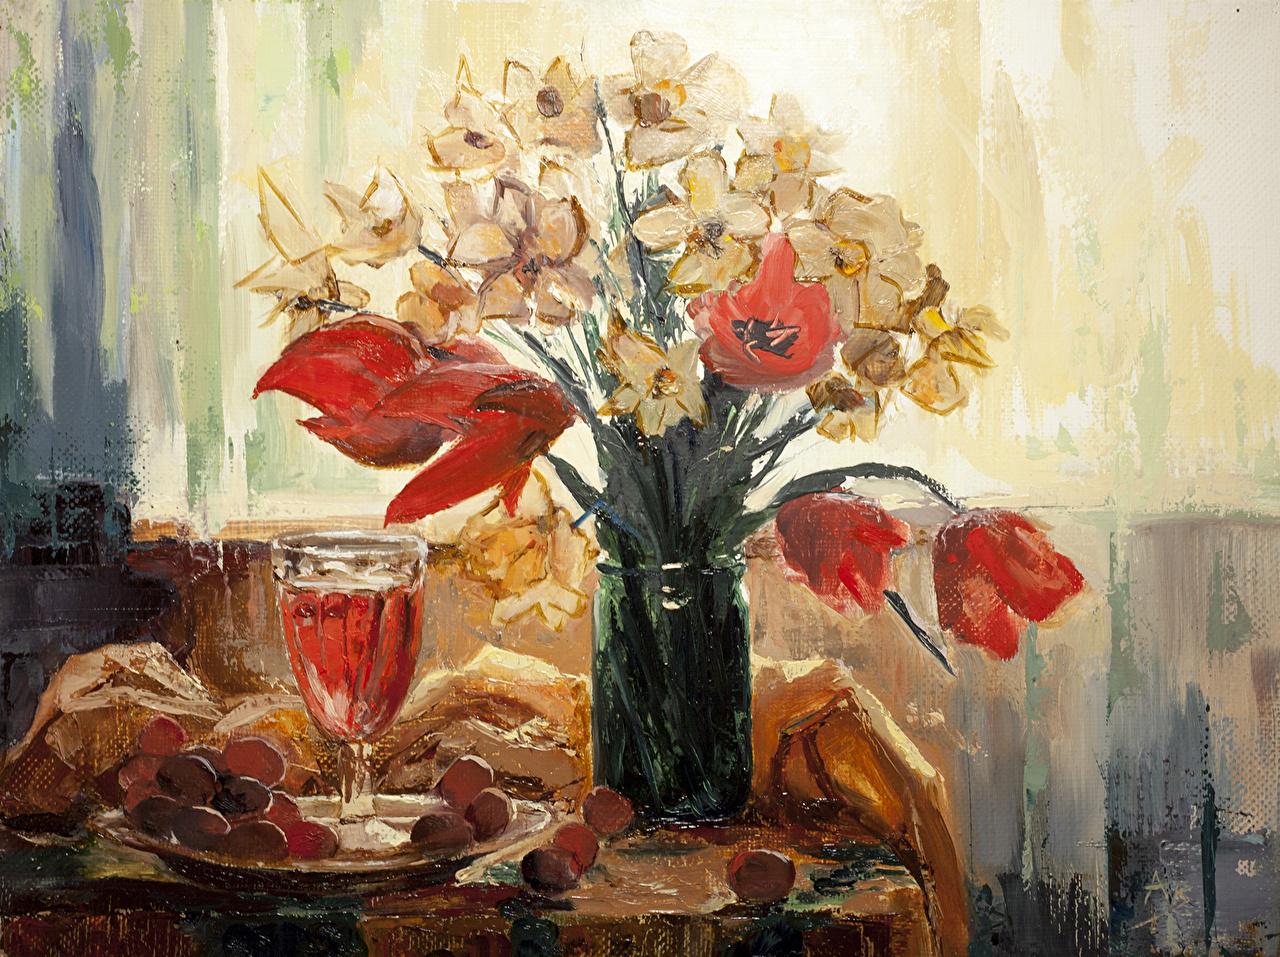 Картинка hangmoon Tulips in the bank тюльпан Цветы Банка Нарциссы бокал Живопись Натюрморт Тюльпаны банке банки цветок Бокалы картина